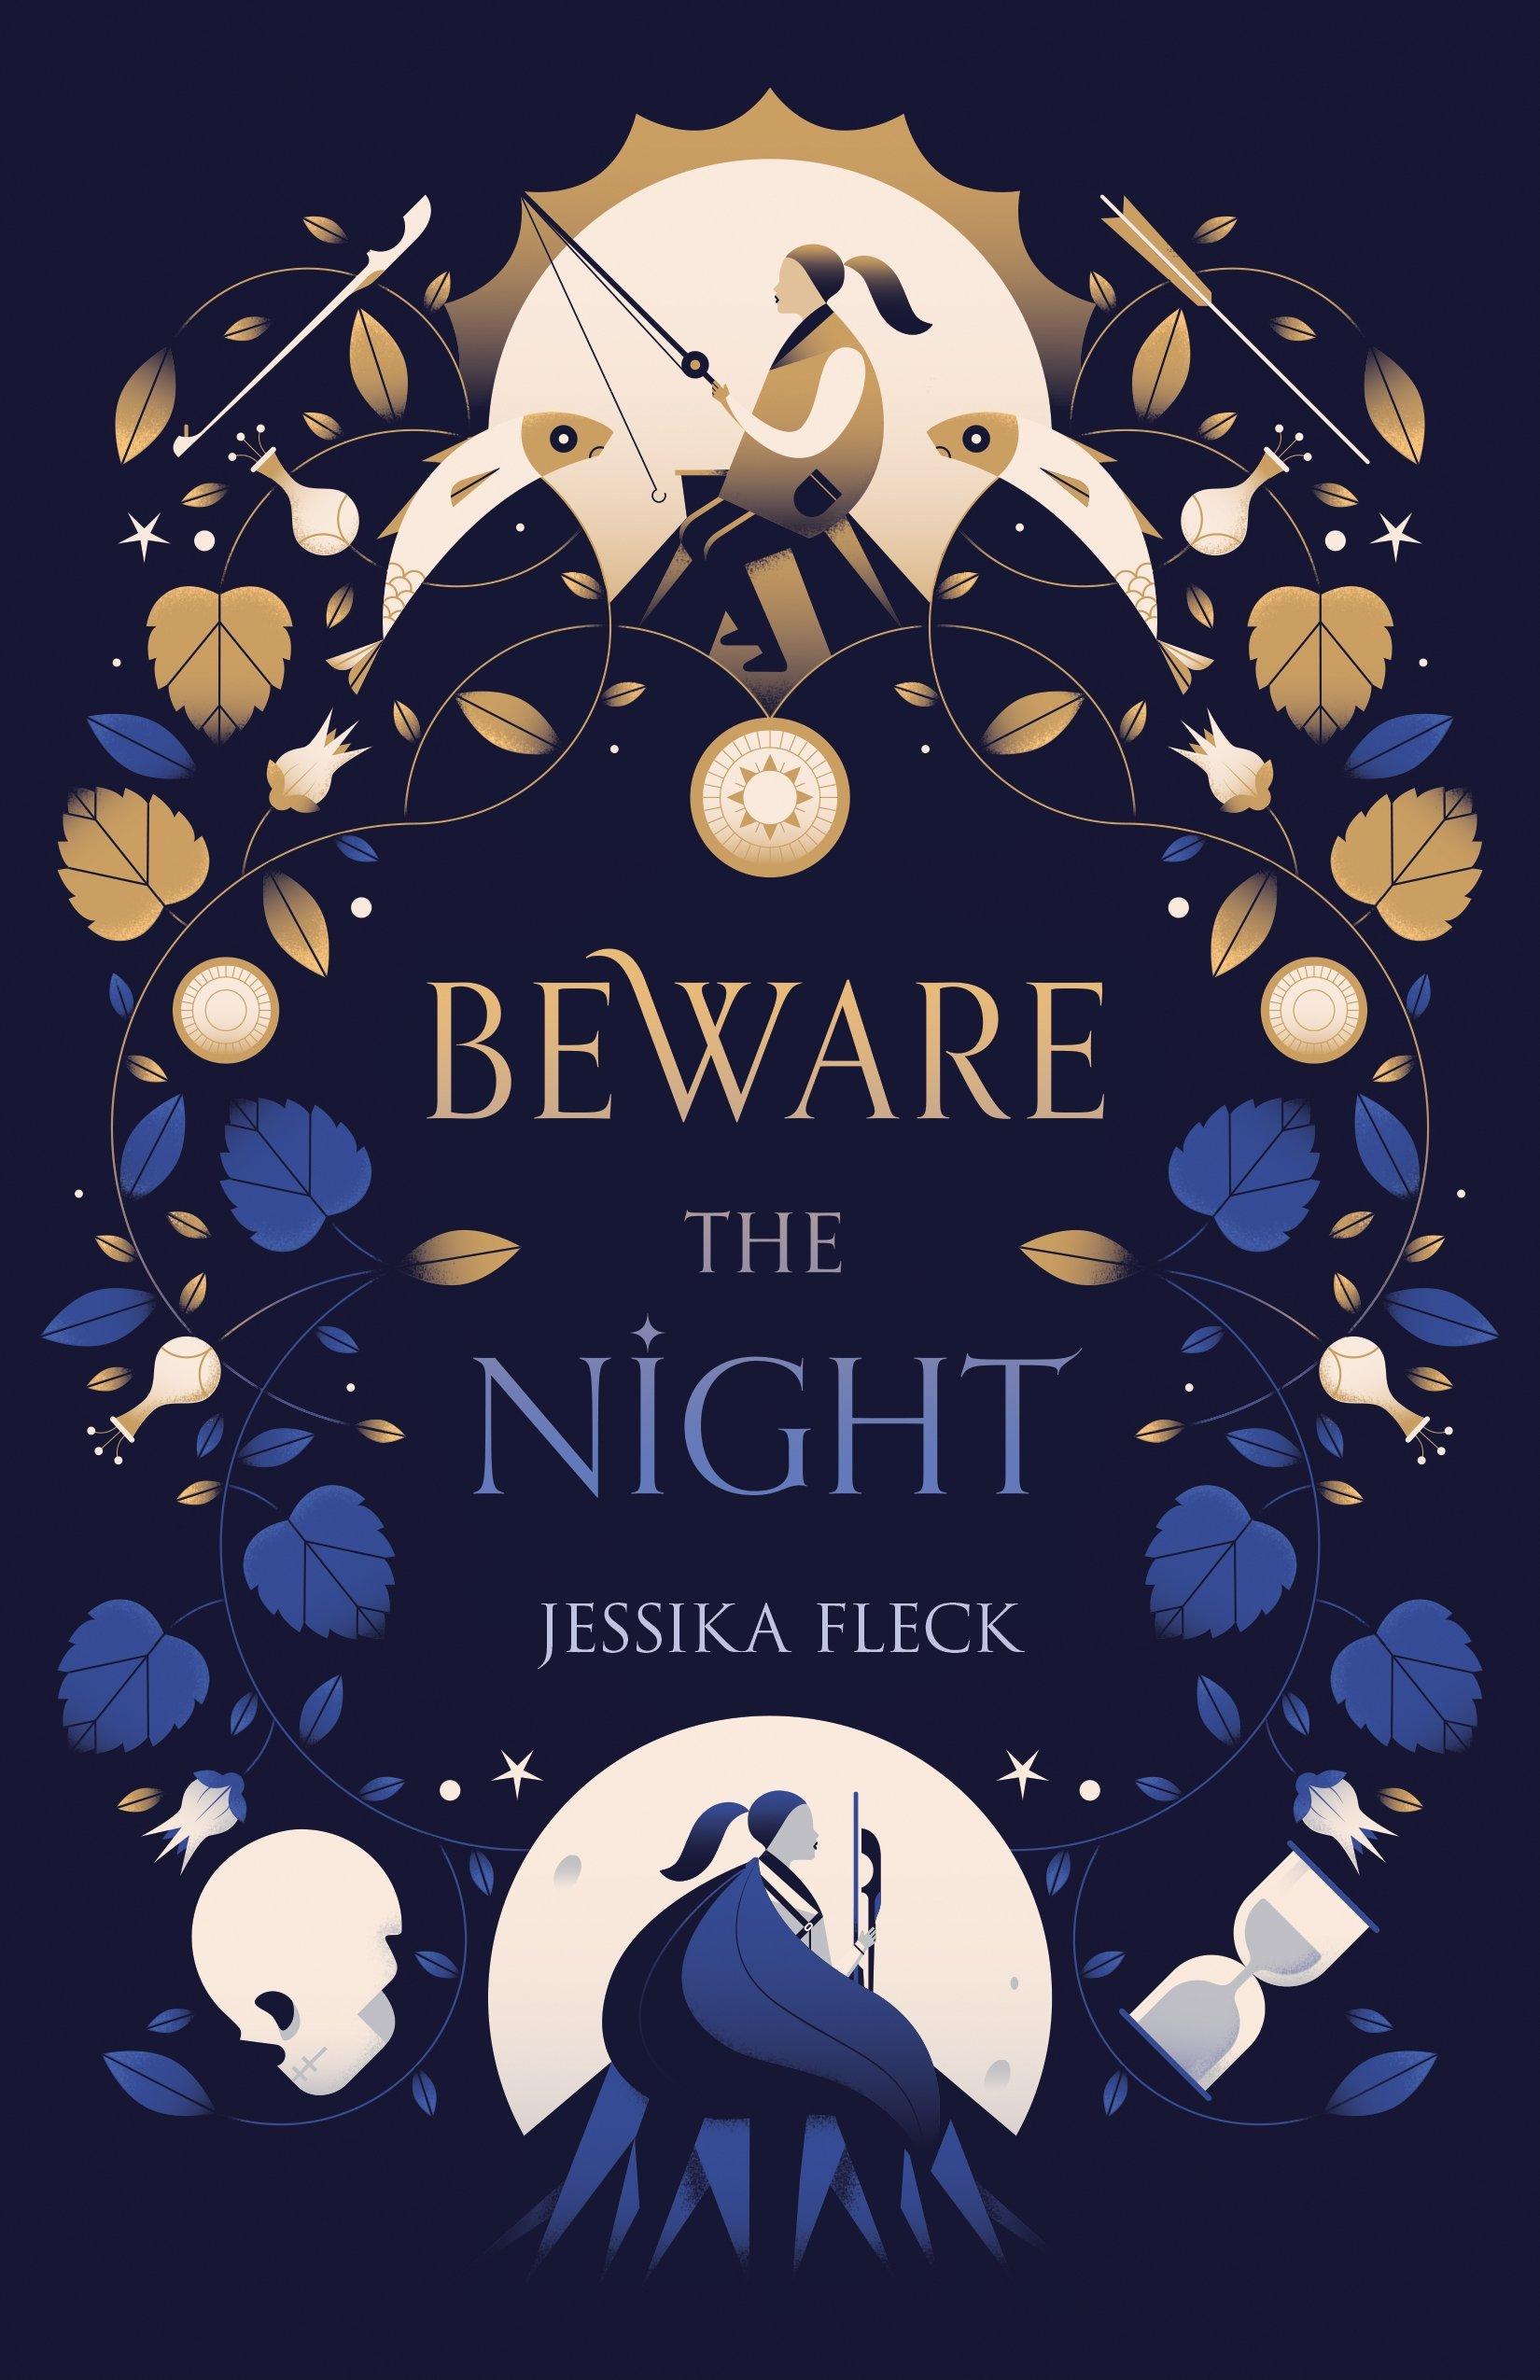 eware the Night by Jessica Fleck